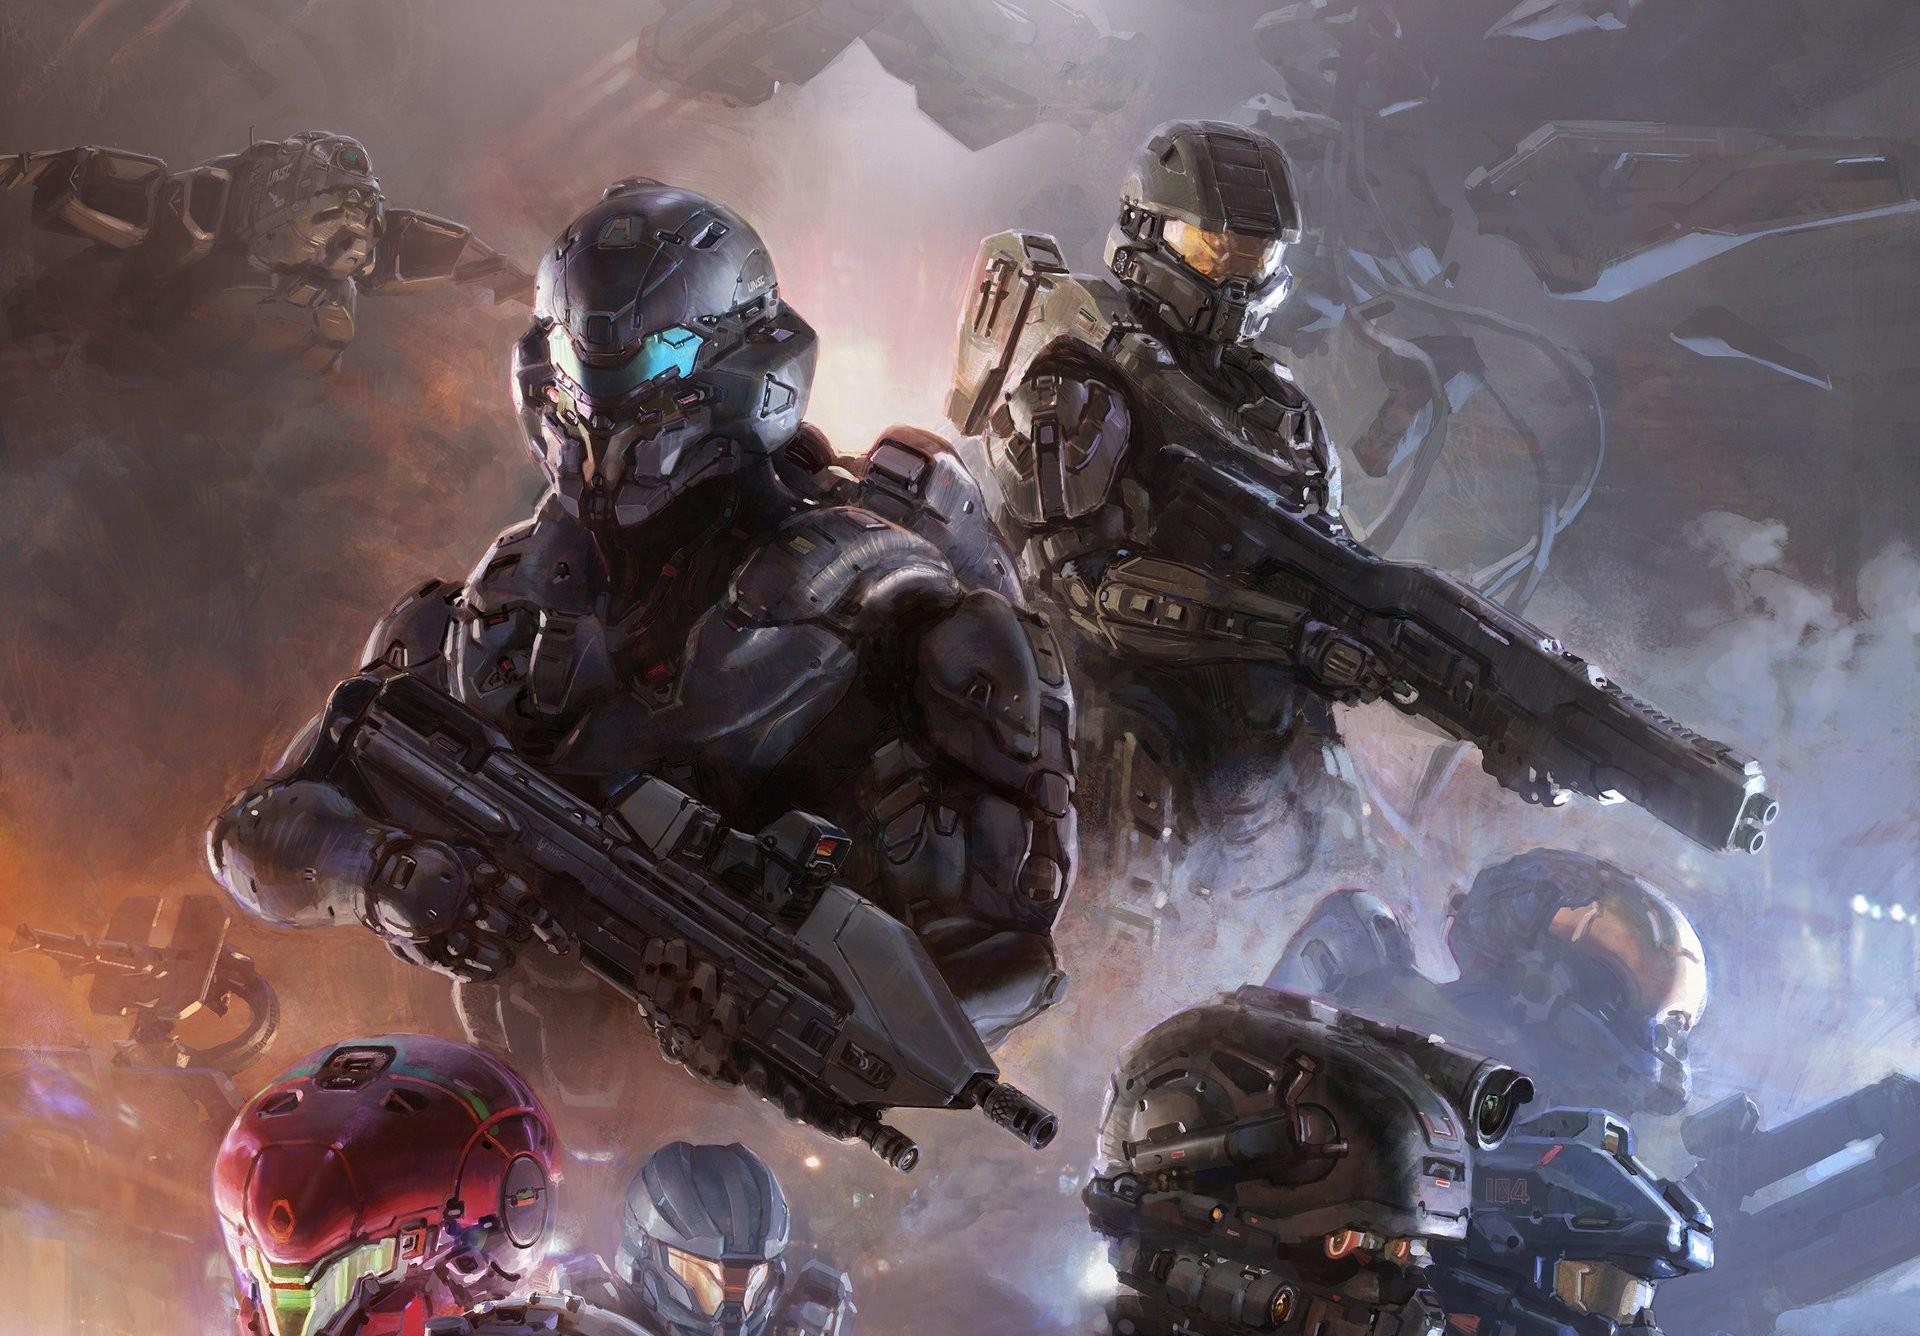 Video Game – Halo 5: Guardians Warrior Weapon Master Chief Armor Futuristic Halo  Wallpaper